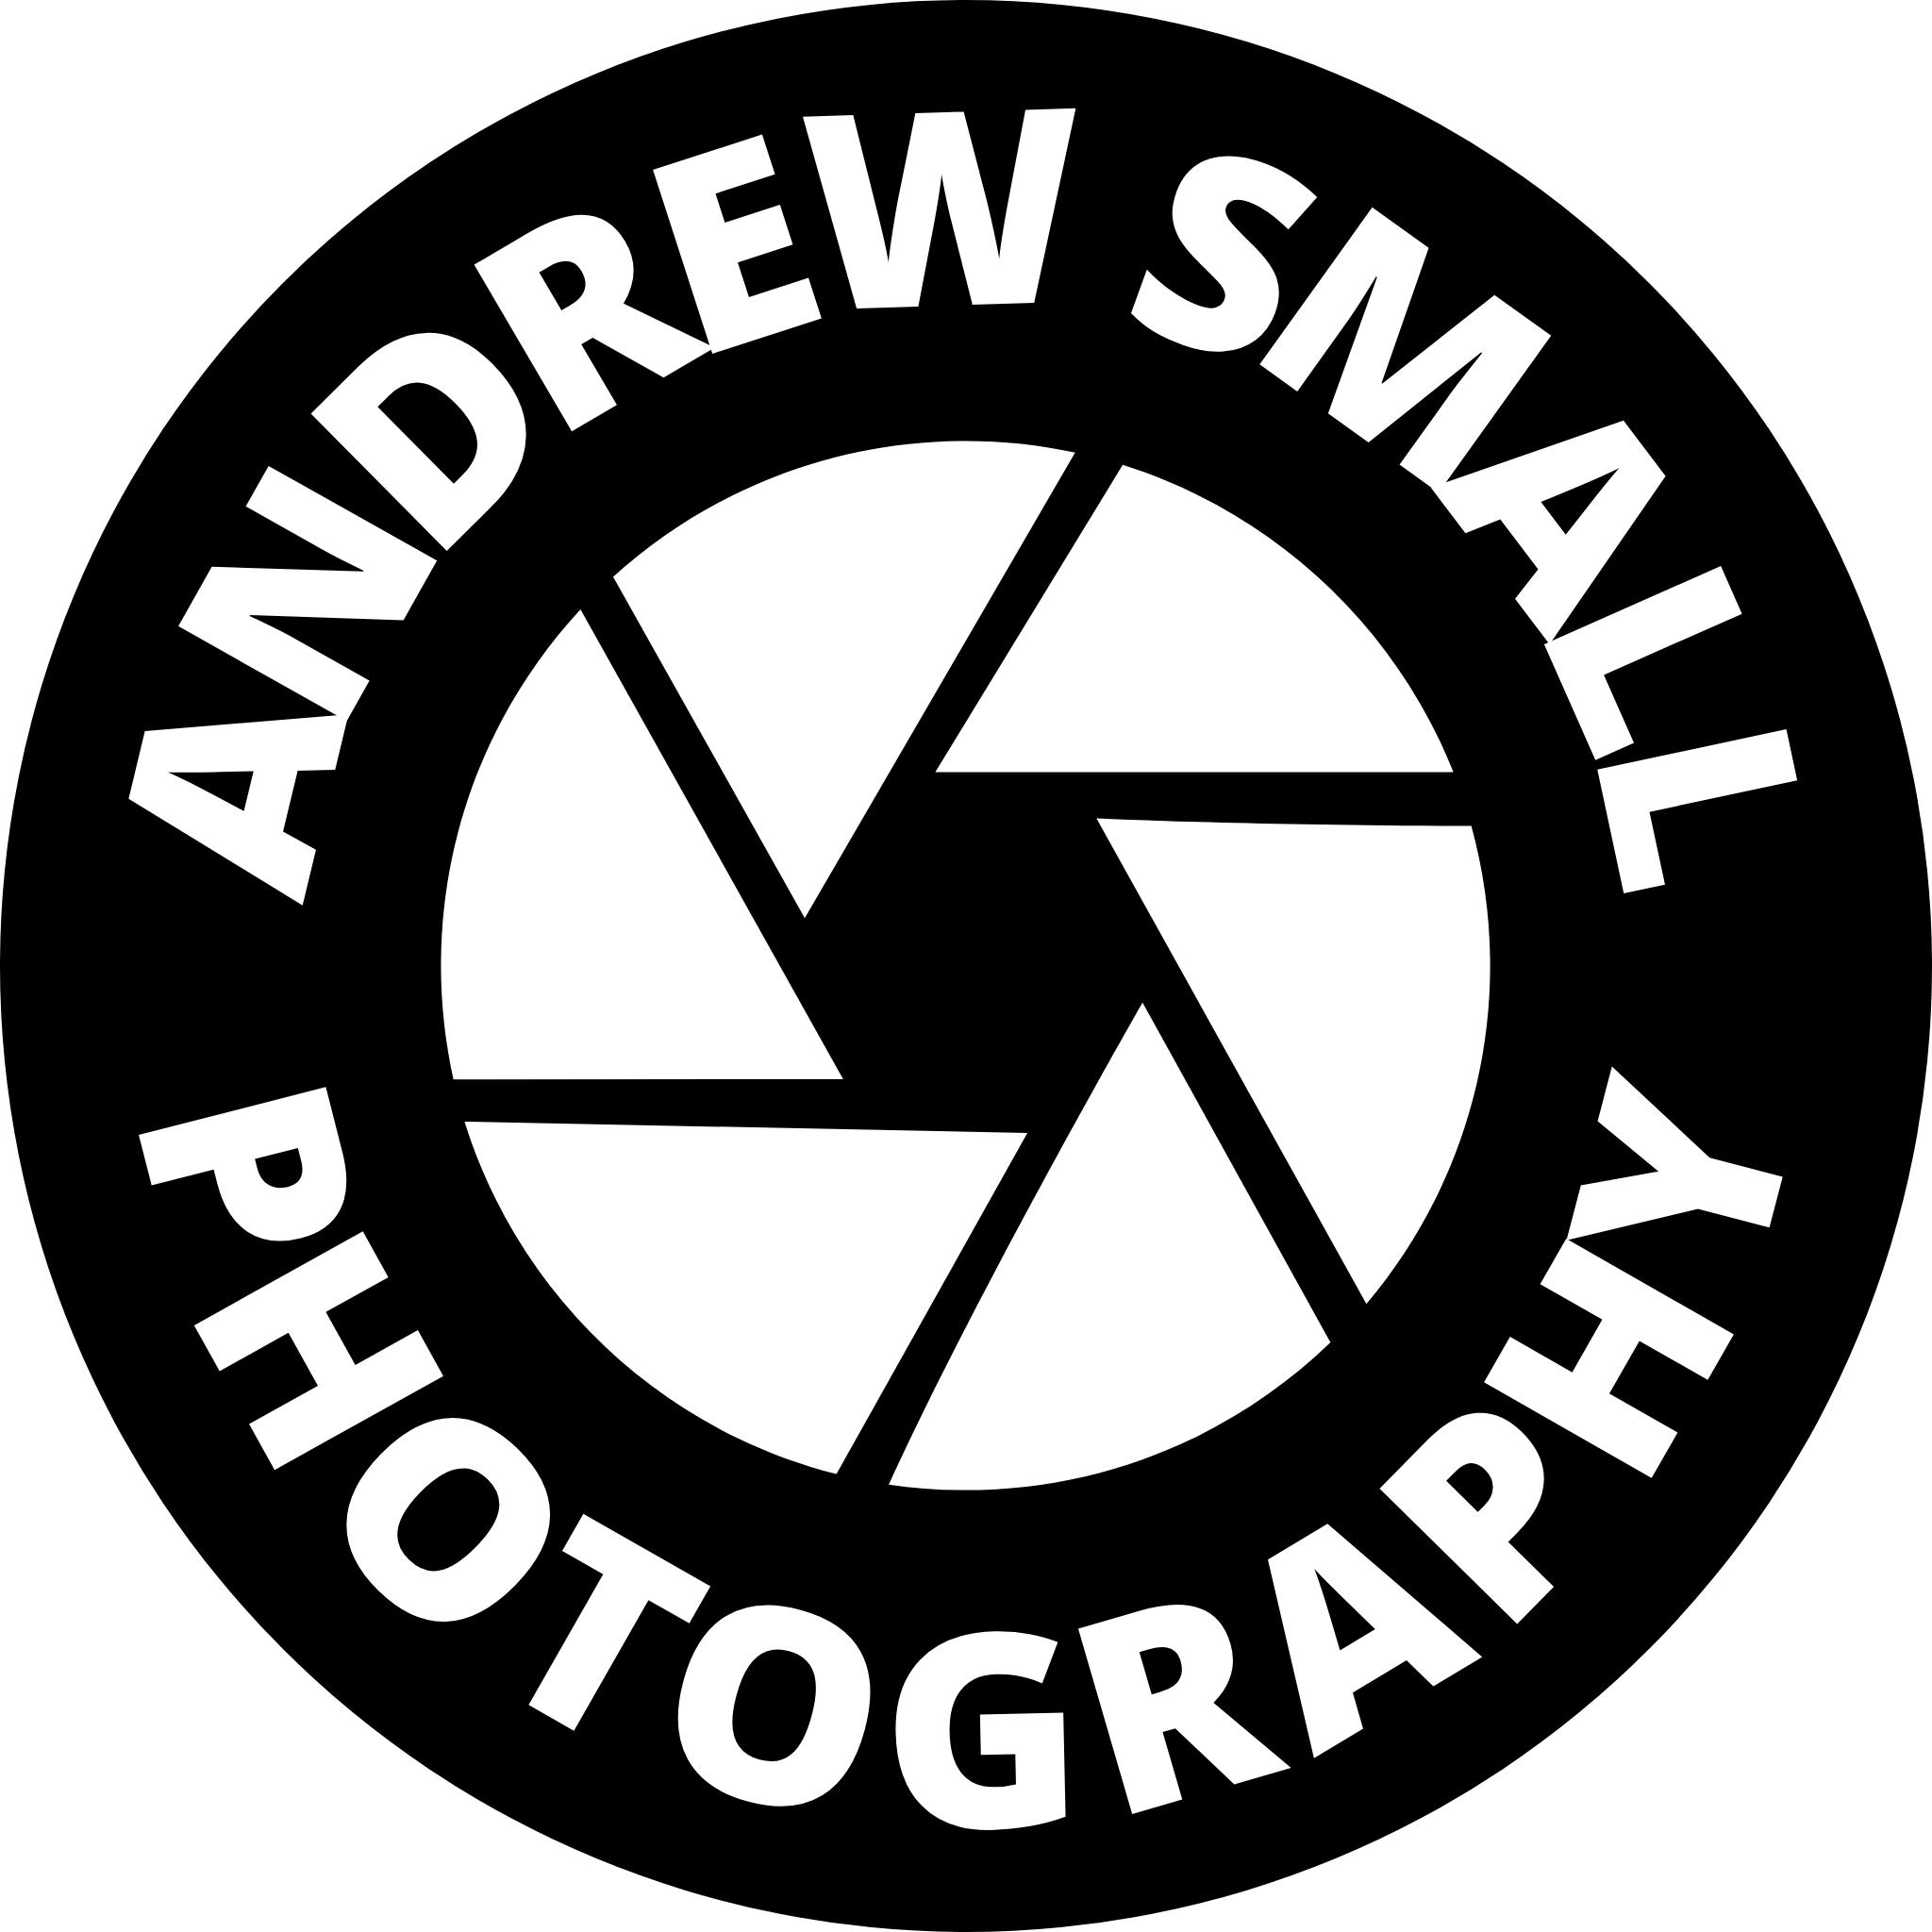 Andrew Small